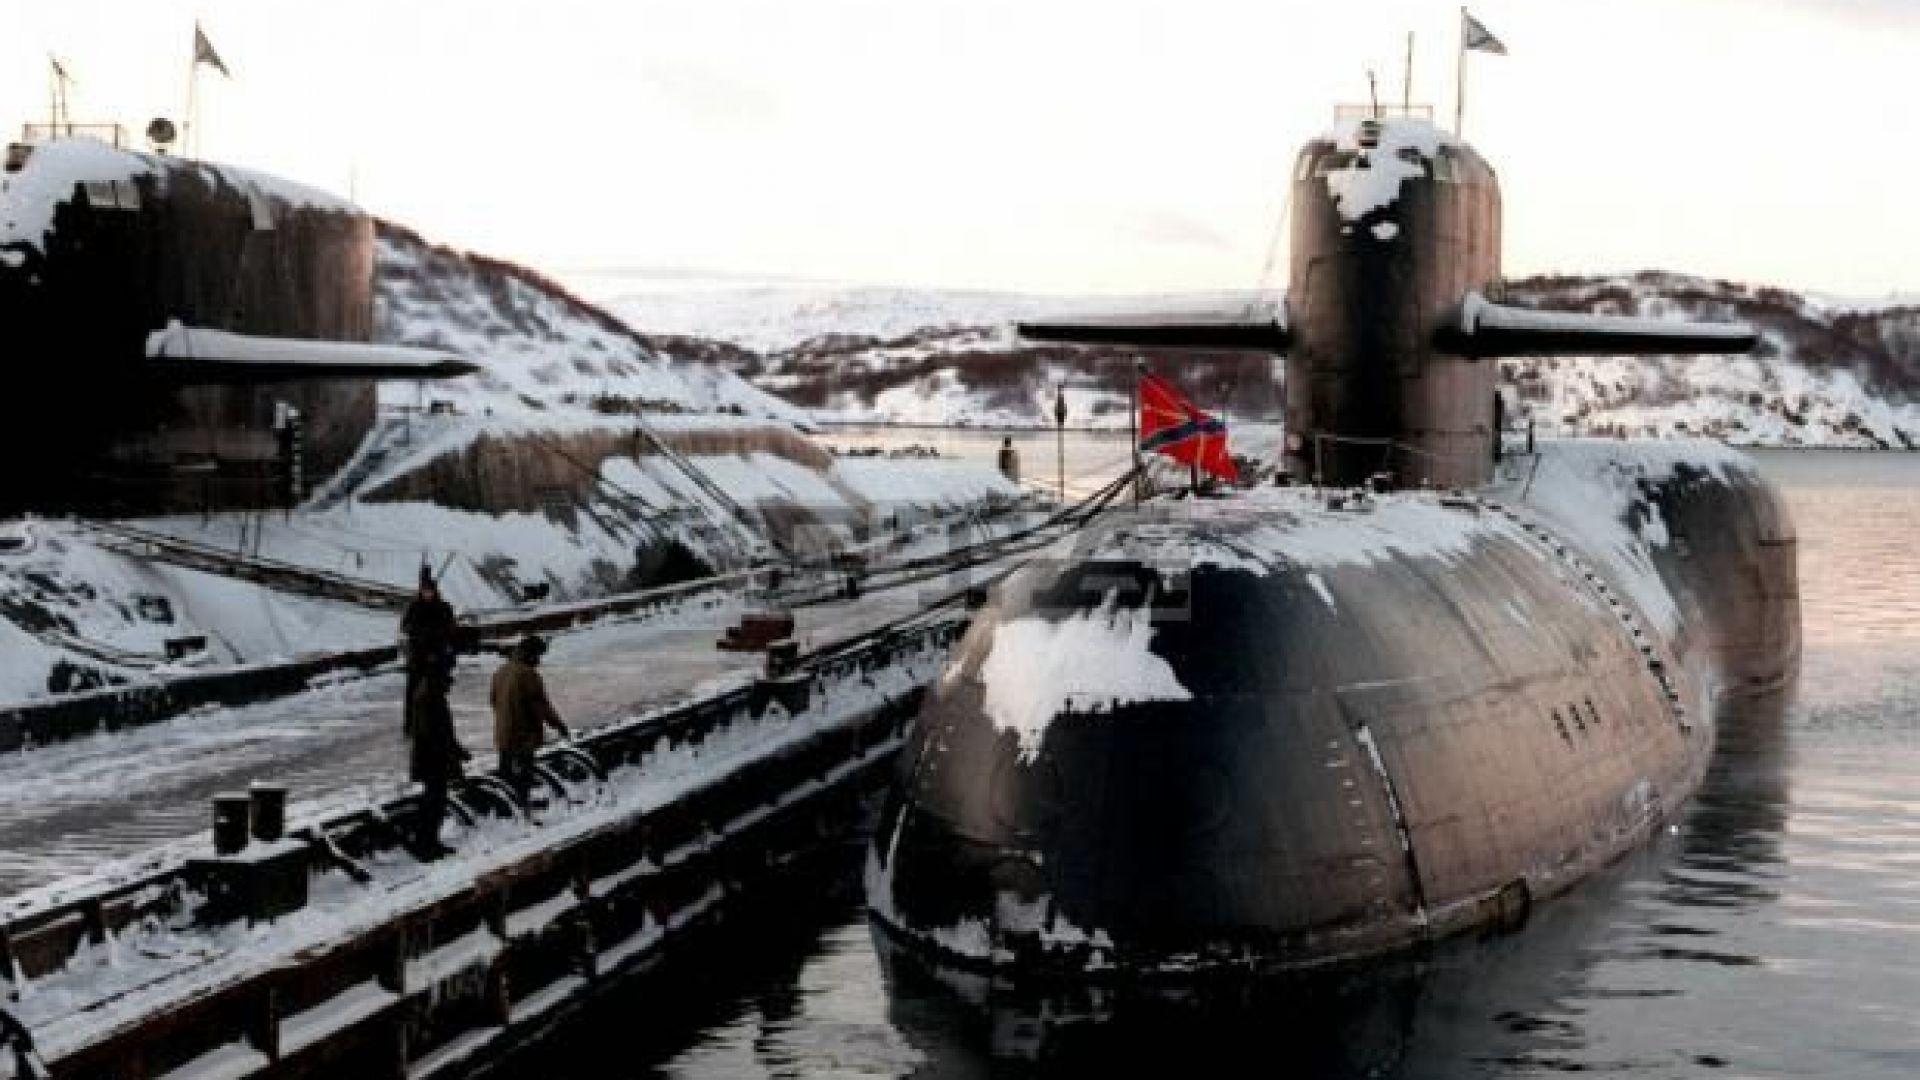 Пожарът на борда на свръхсекретната руска ядрена подводница е можел